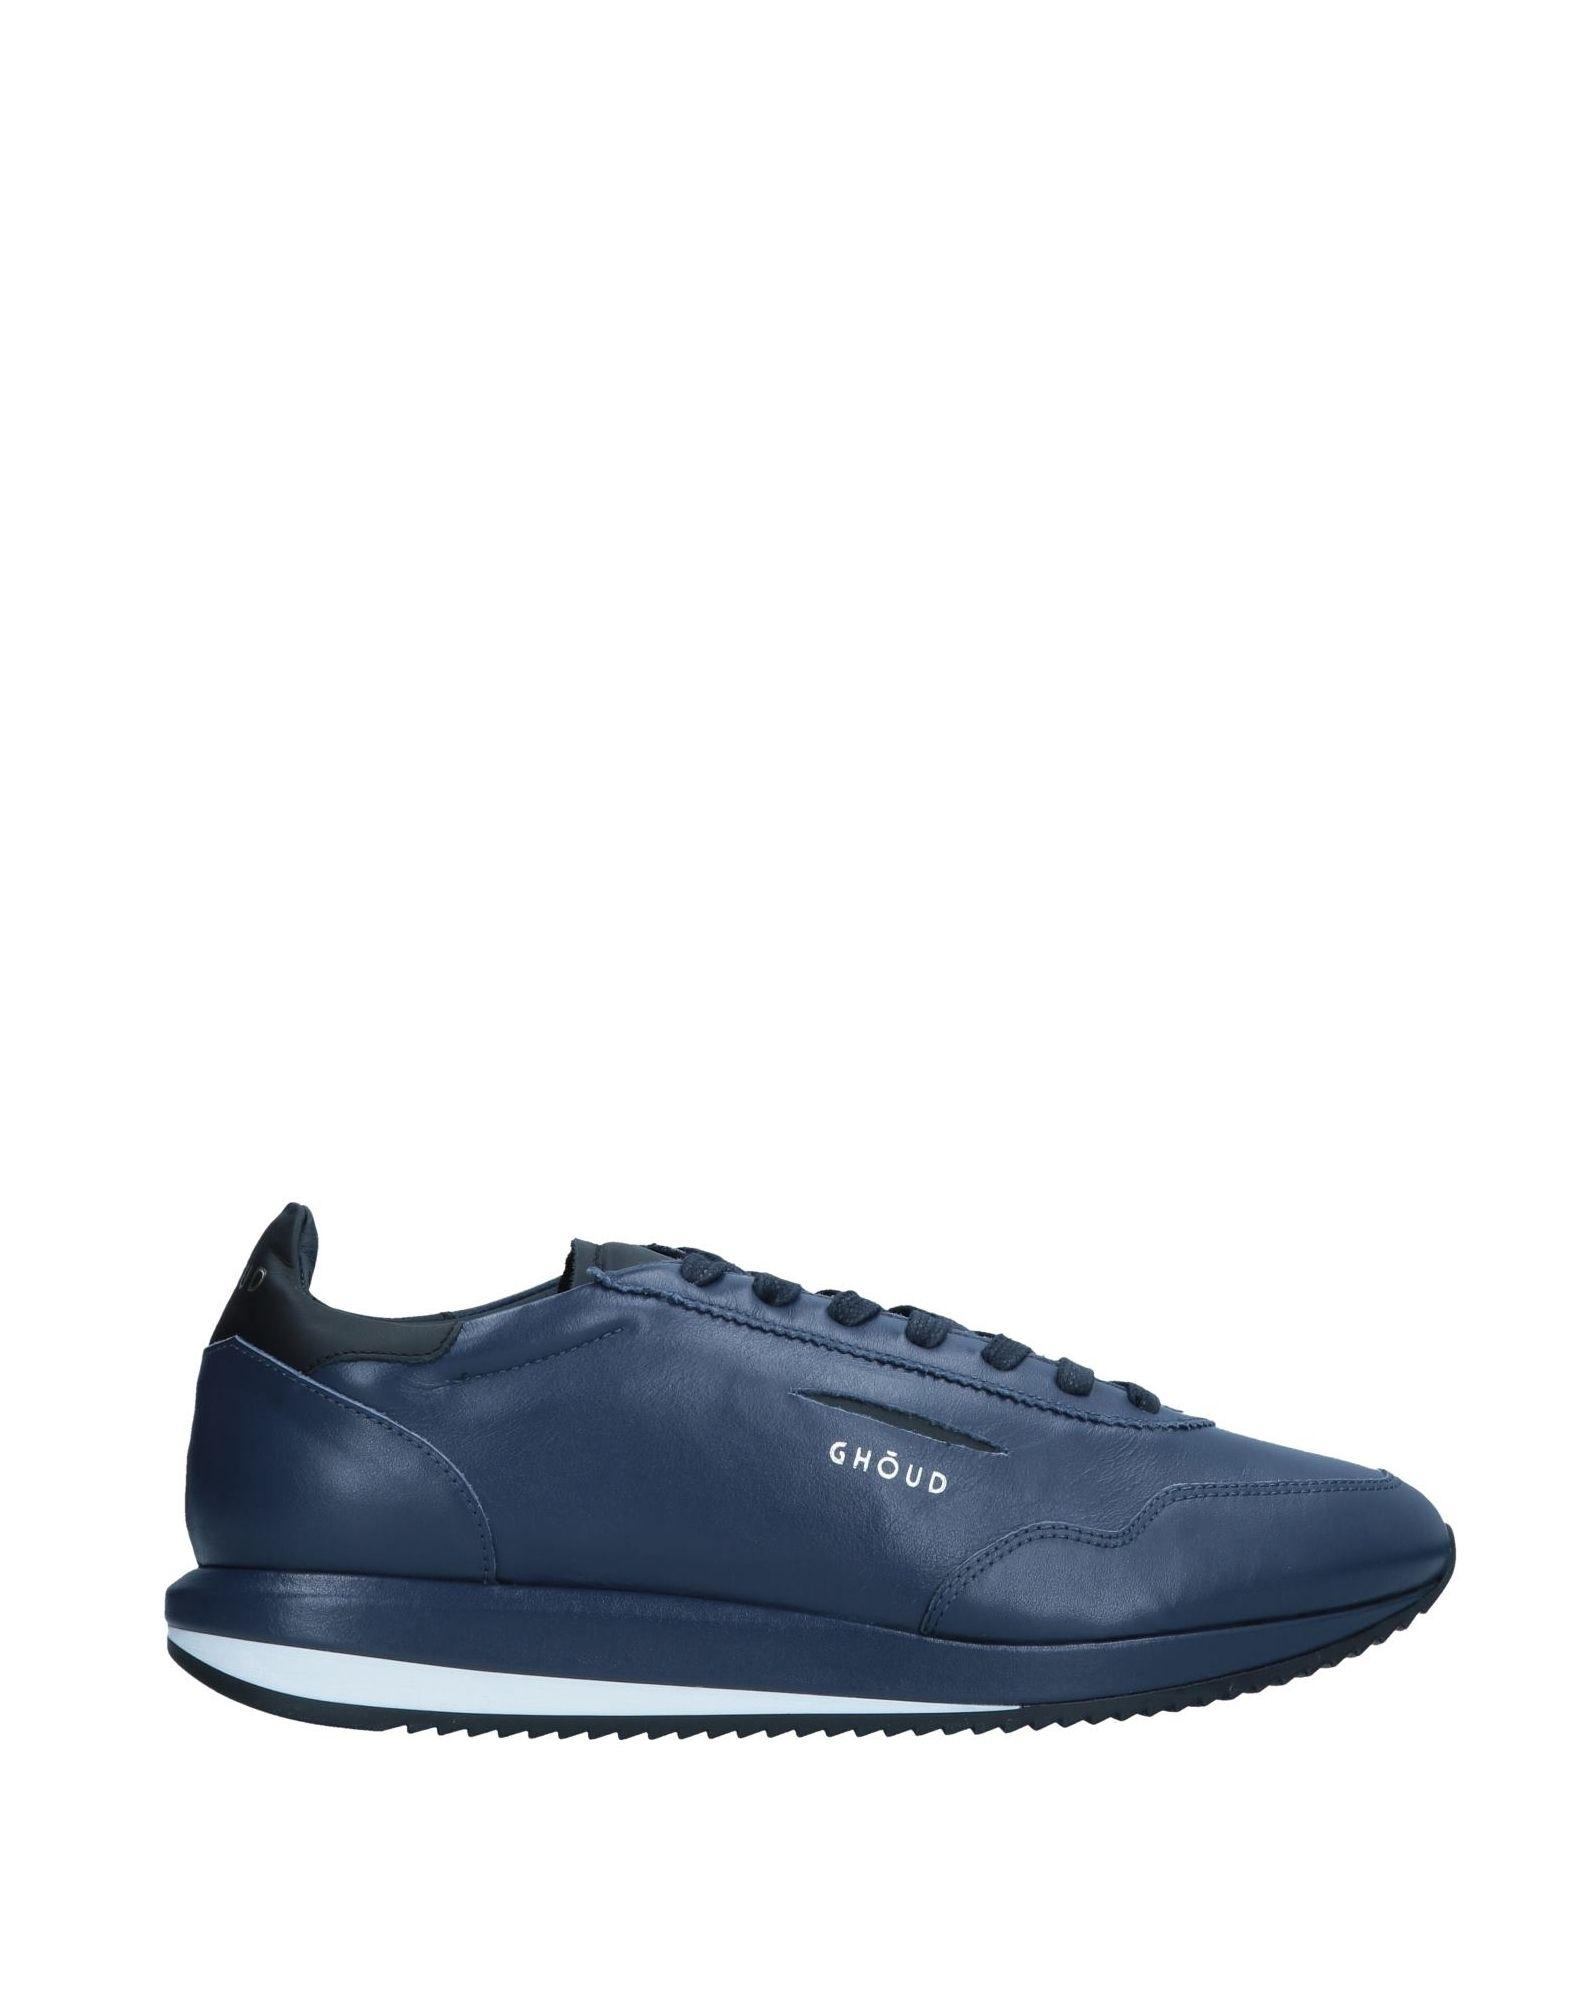 Ghōud Venice Sneakers Herren  11545385FL Gute Qualität beliebte Schuhe